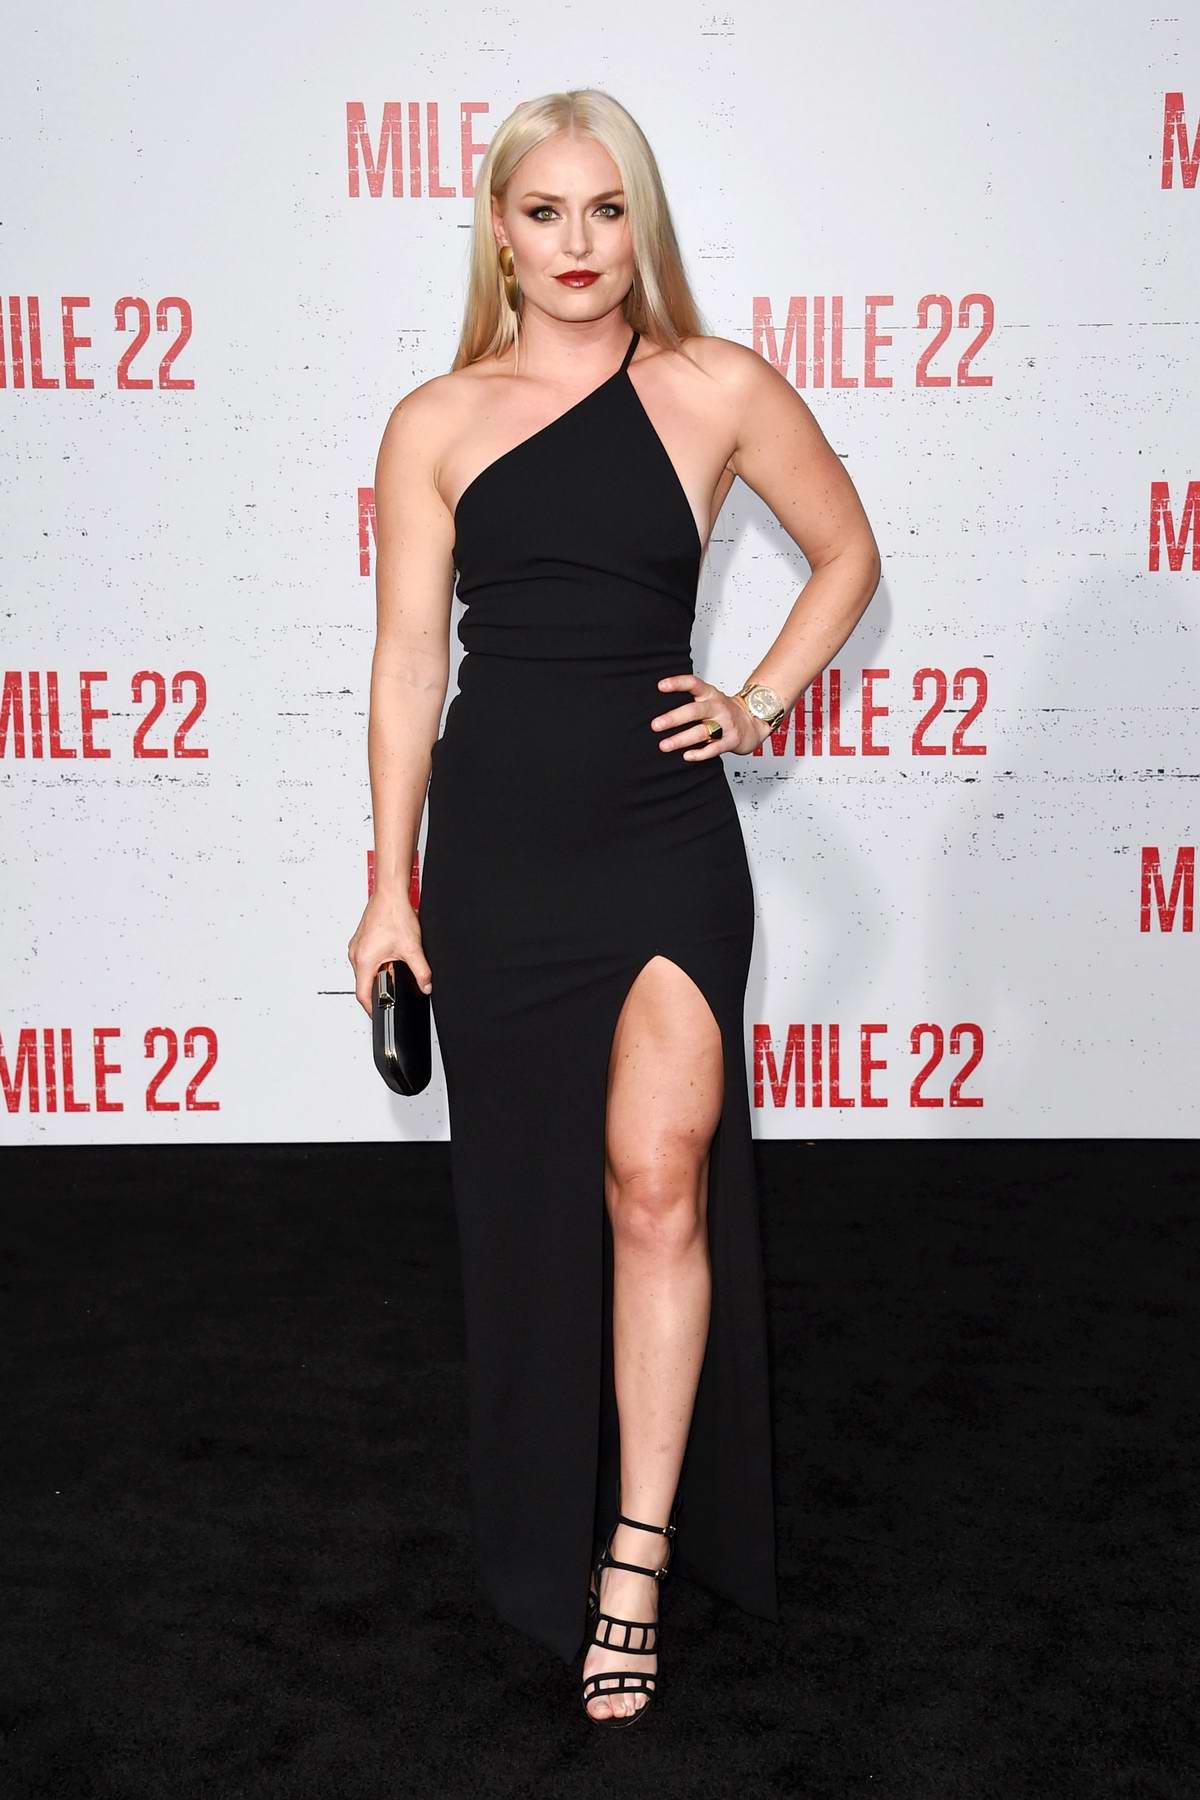 Lindsey Von attends 'Mile 22' film premiere in Los Angeles